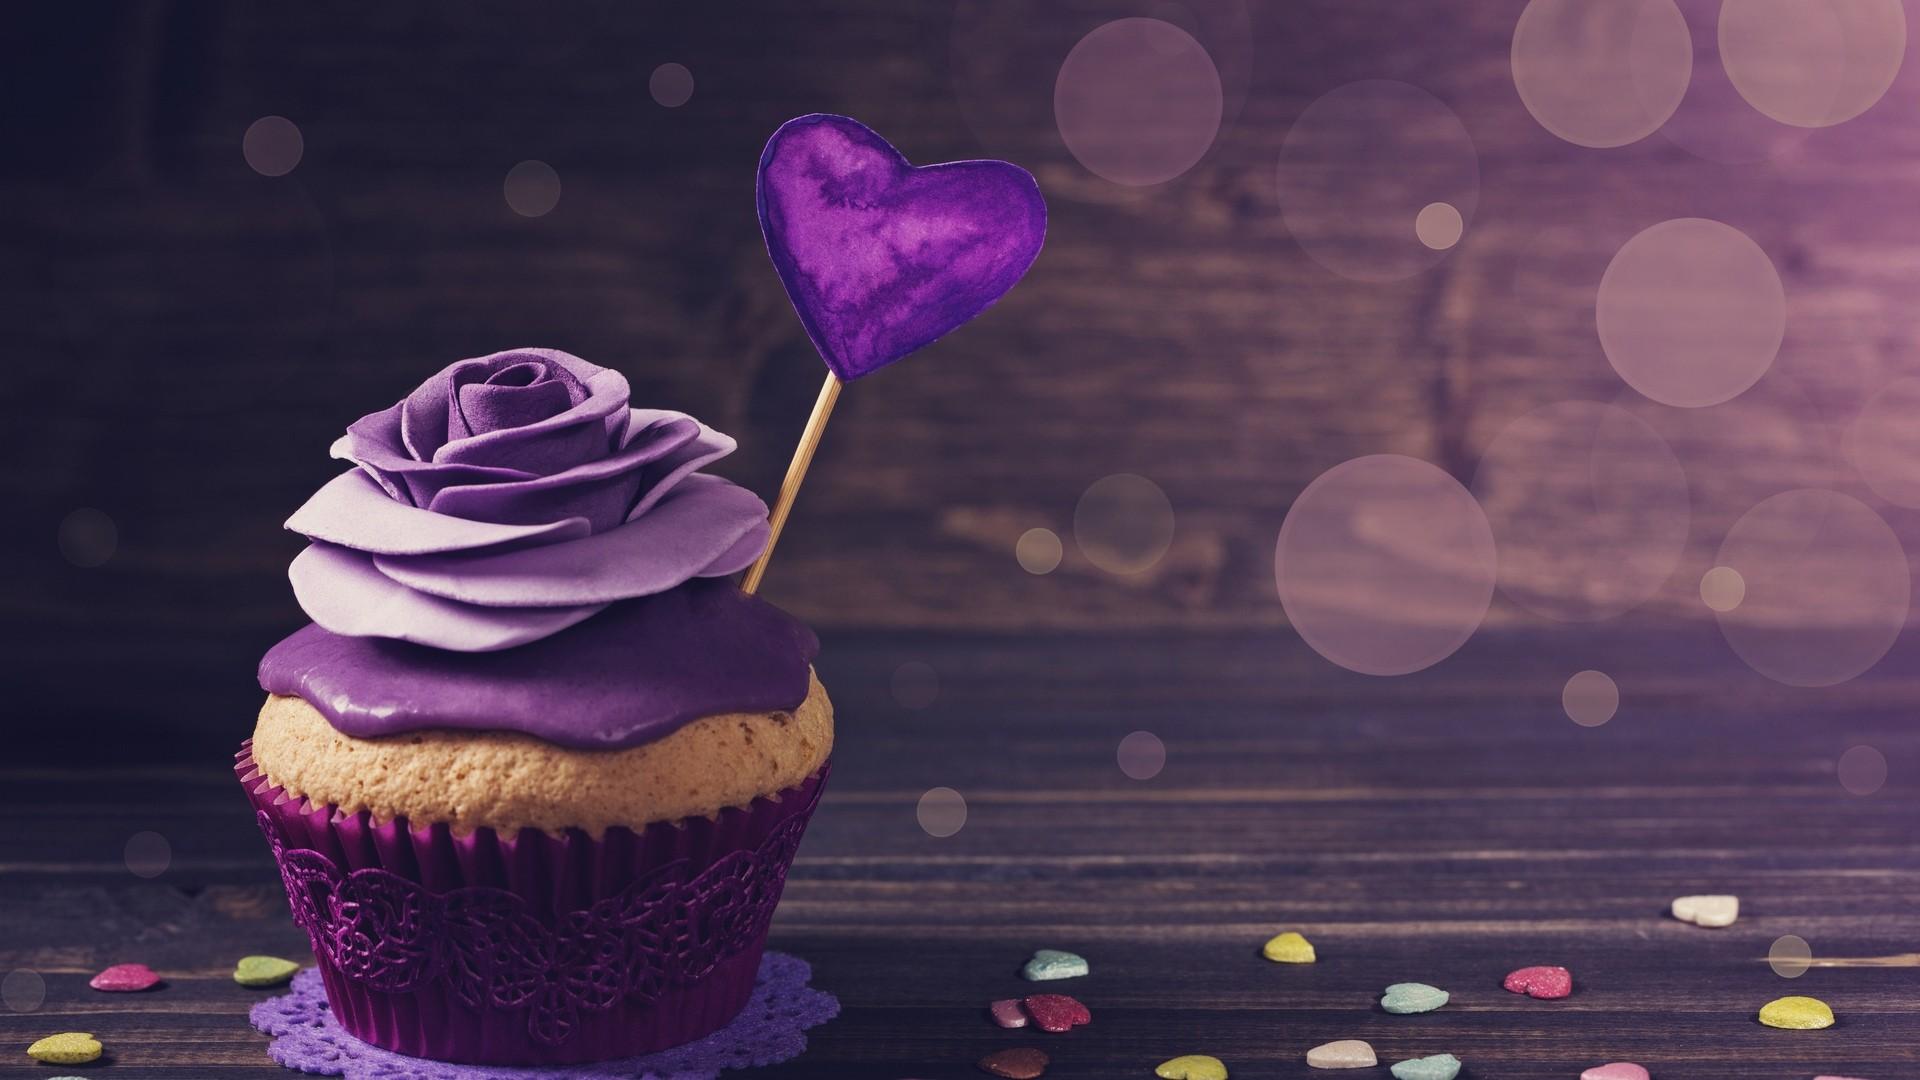 Cupcake a wallpaper